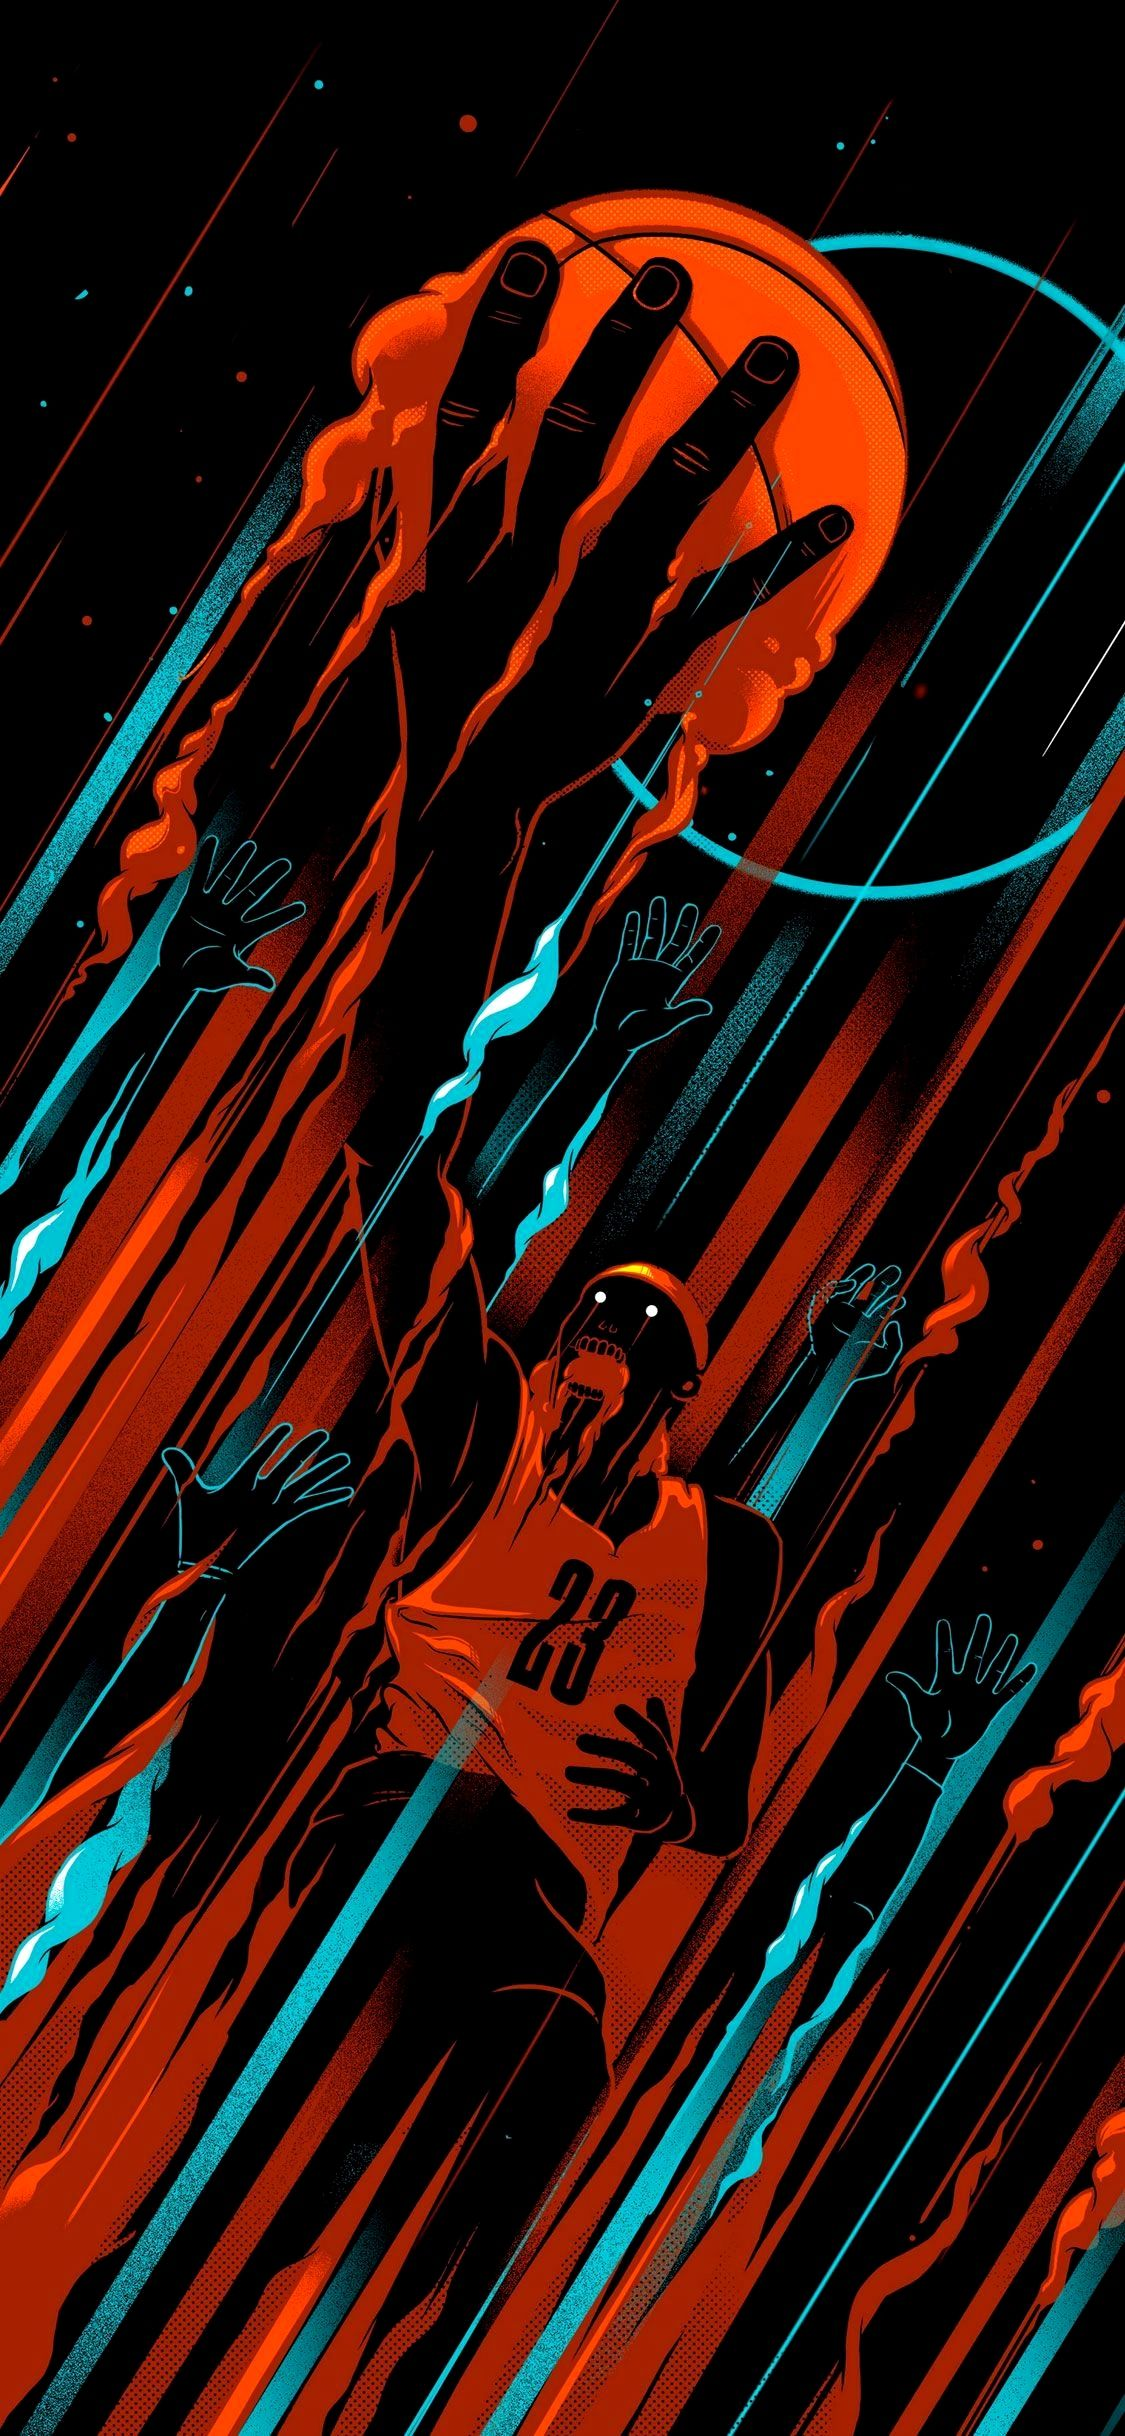 Nba Wallpaper 4K Iphone Trick Basketball iphone wallpaper 1125x2436